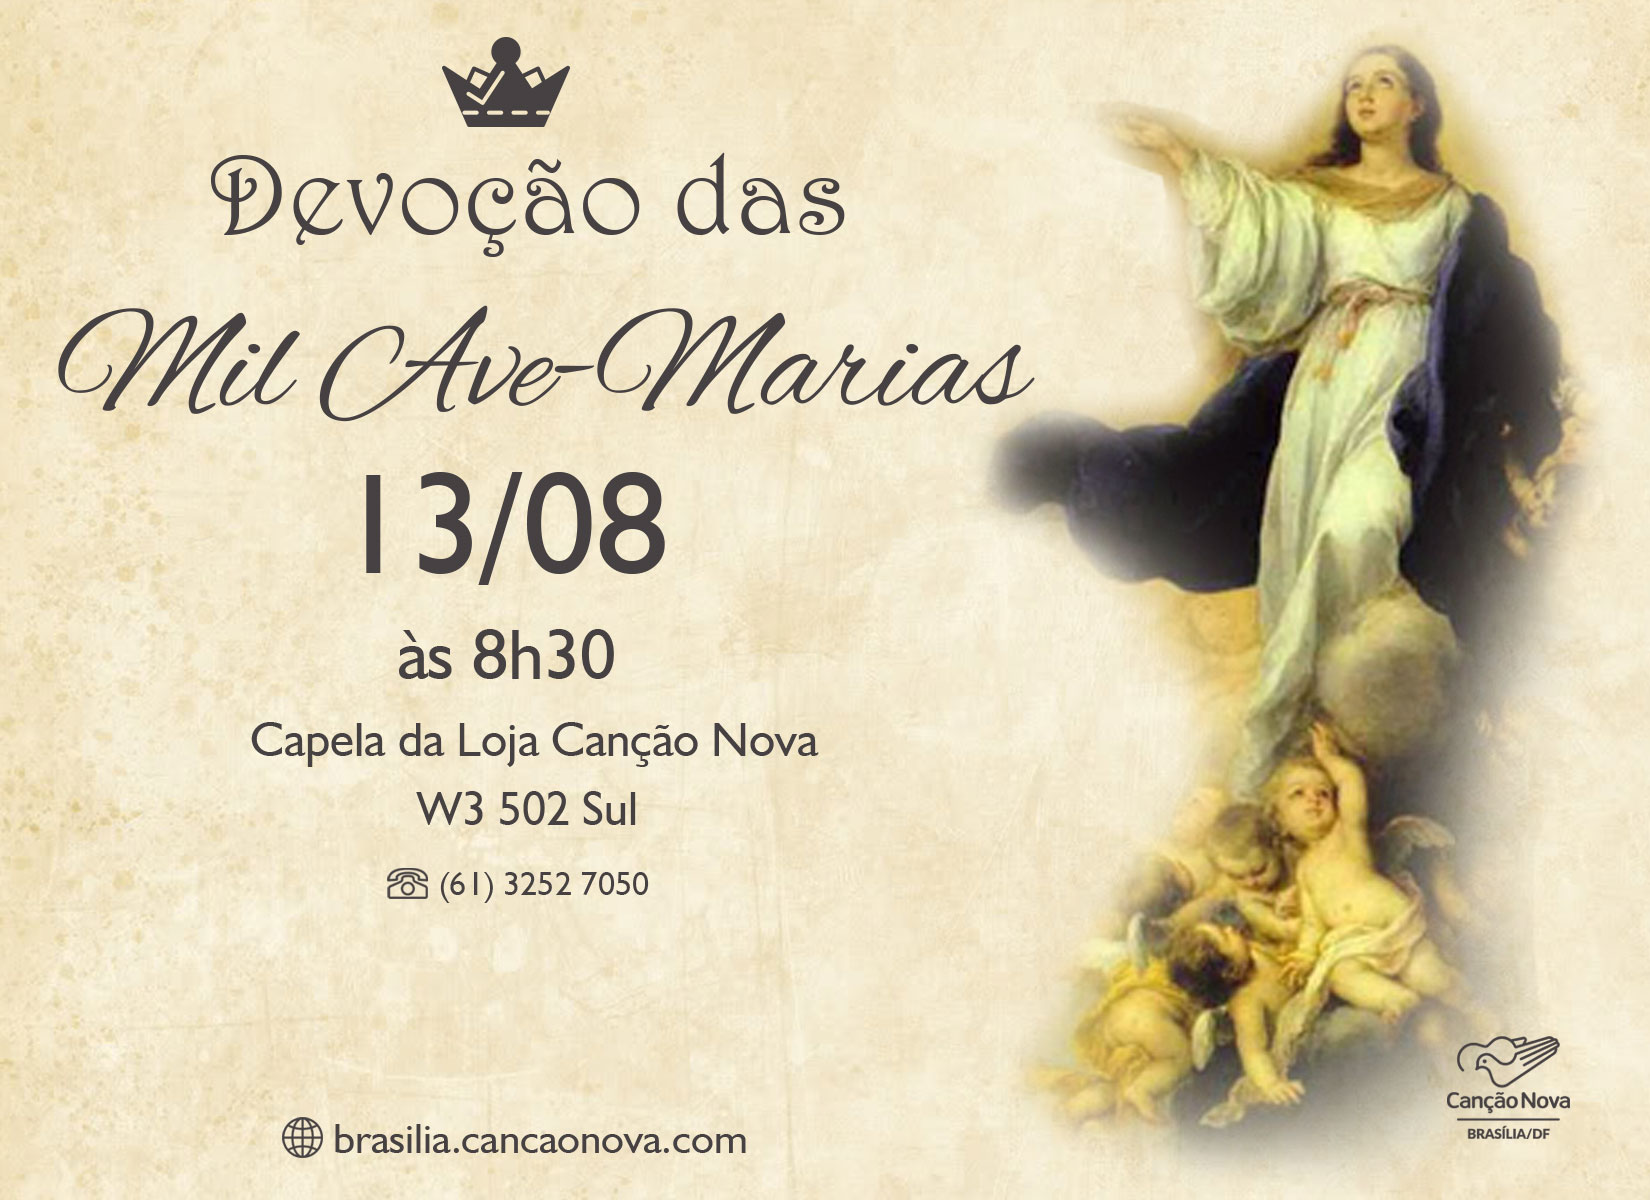 Mil-Ave-Marias